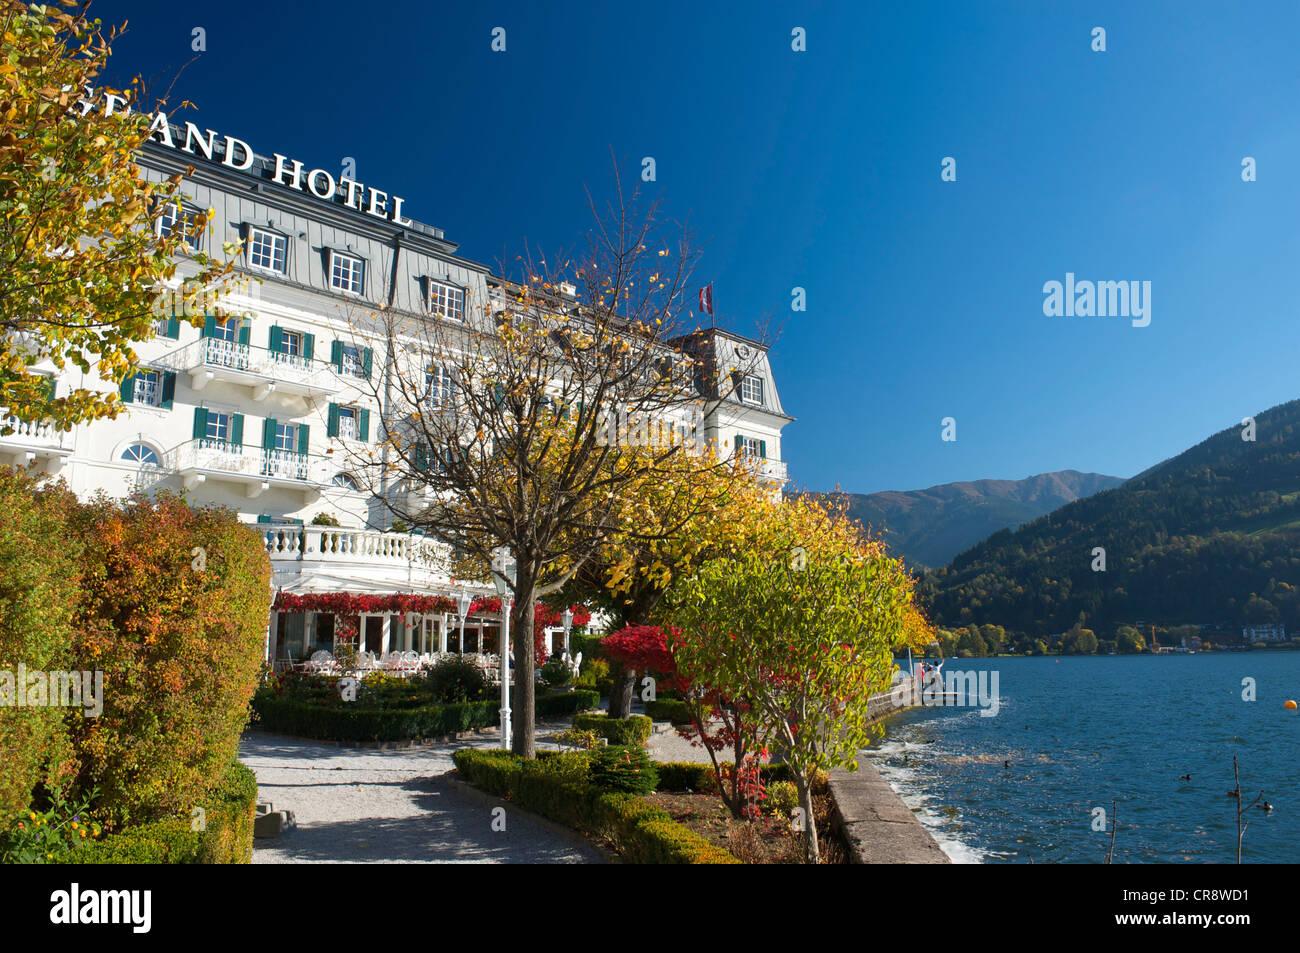 Grand Hotel in Zell am See, Lake Zell, Pinzgau region, Salzburger Land, Austria, Europe Stock Photo